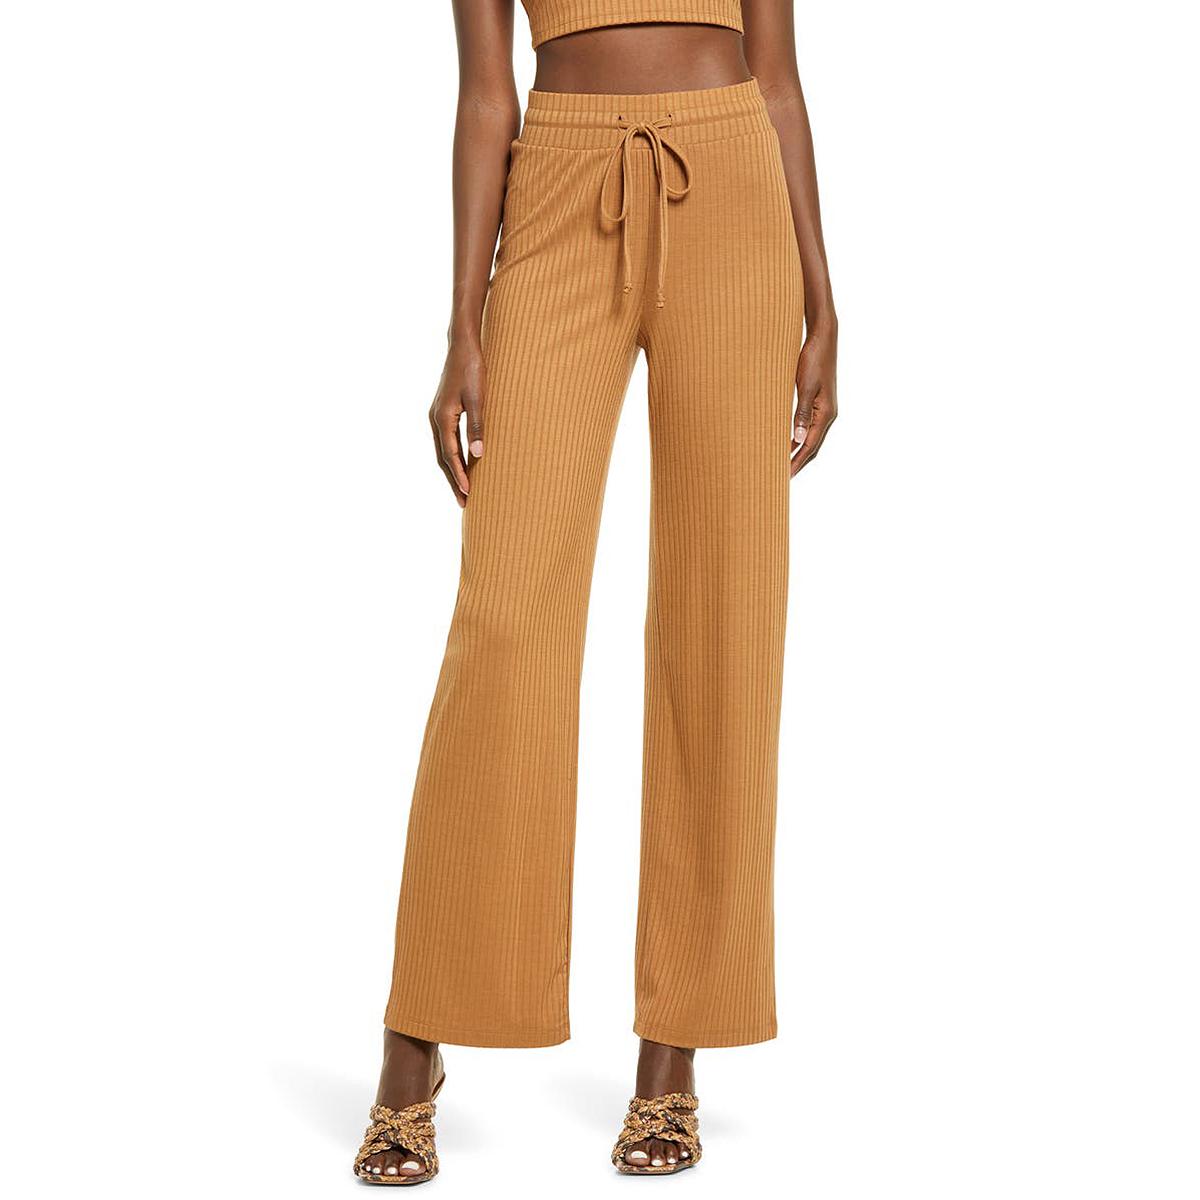 nordstrom-anniversary-sale-rib-pants